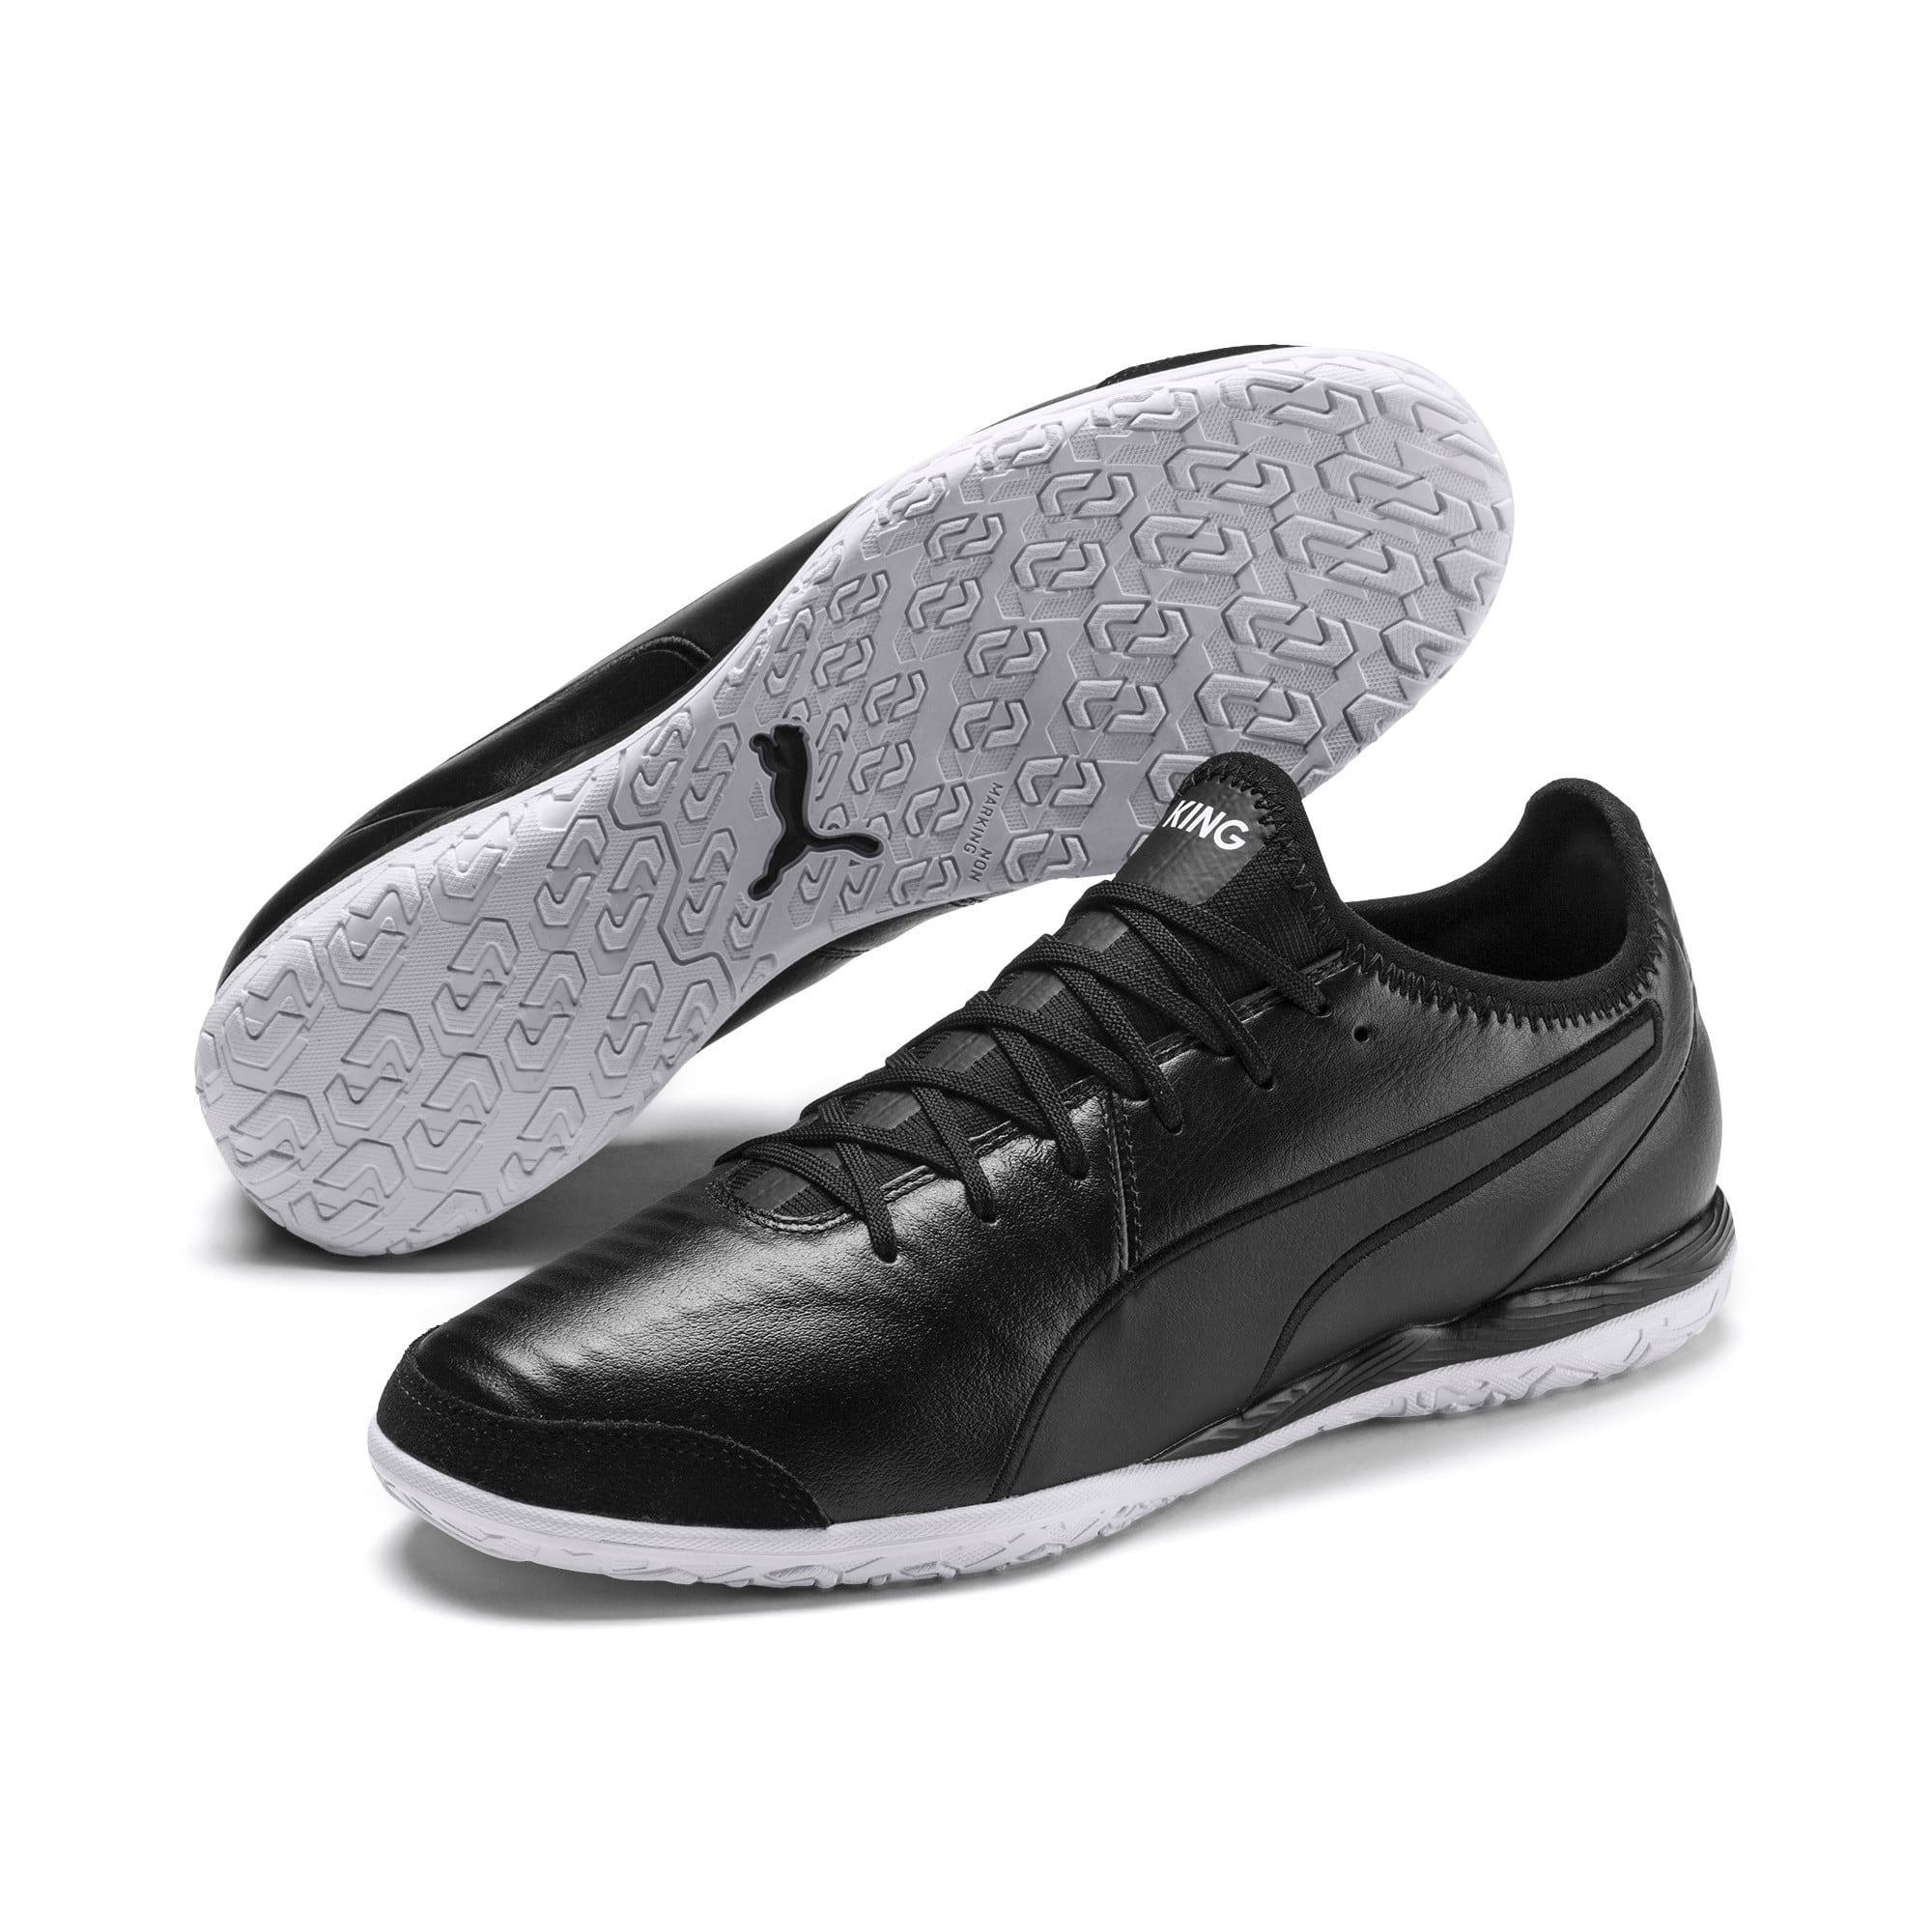 Thumbnail 2 of King Pro IT Soccer Shoes, Puma Black-Puma White, medium